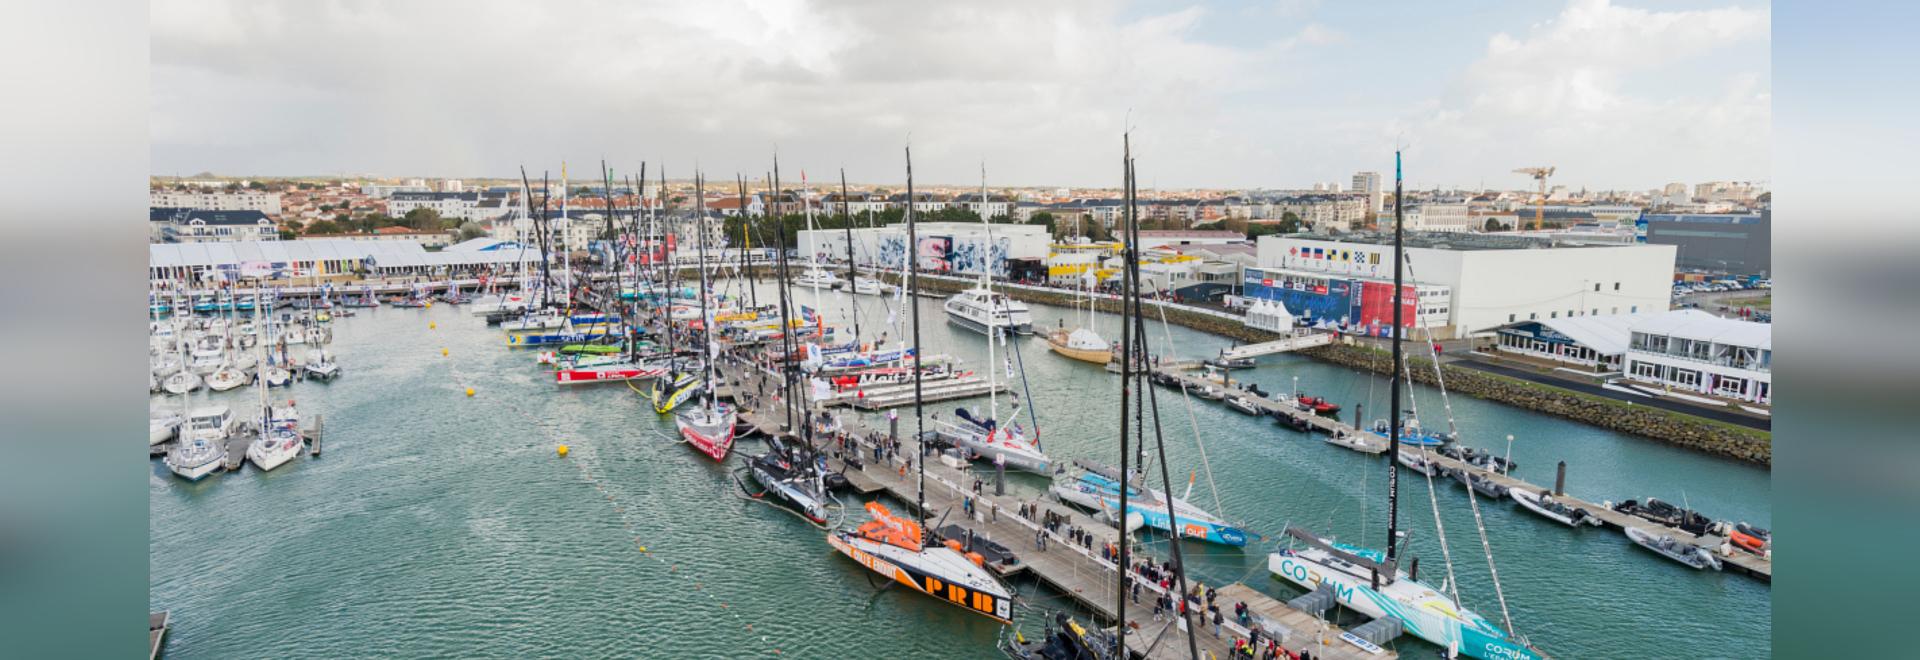 Wie Sie dem Vendée-Globe 2020 folgen